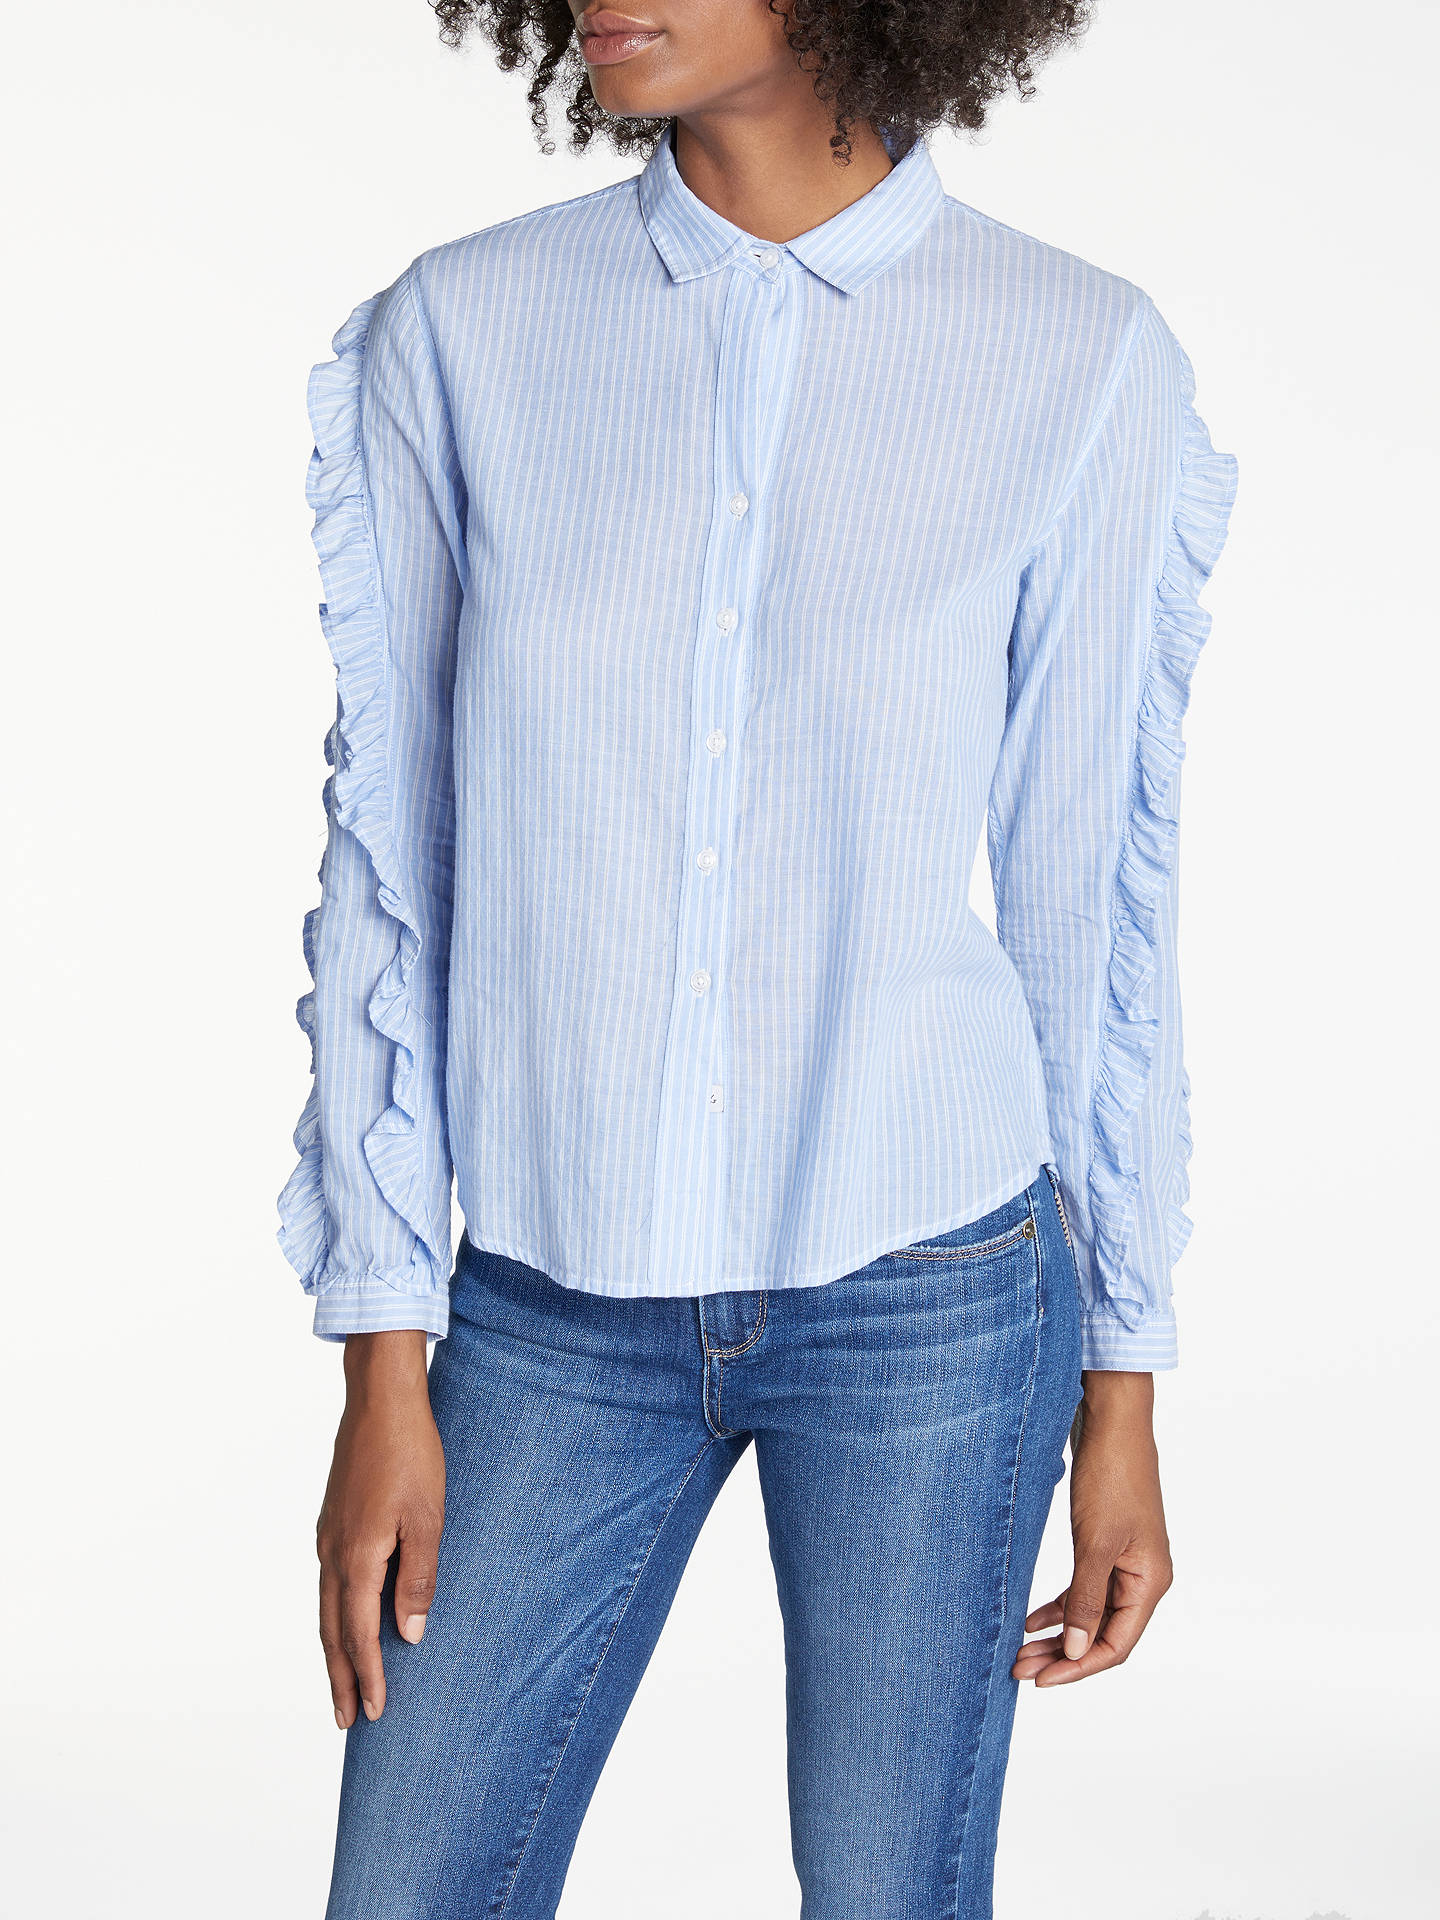 720e8953f932f7 Buy Rails Lizzi Ruffle Sleeve Shirt, Bellflower/White Mini Stripe, XS  Online at ...